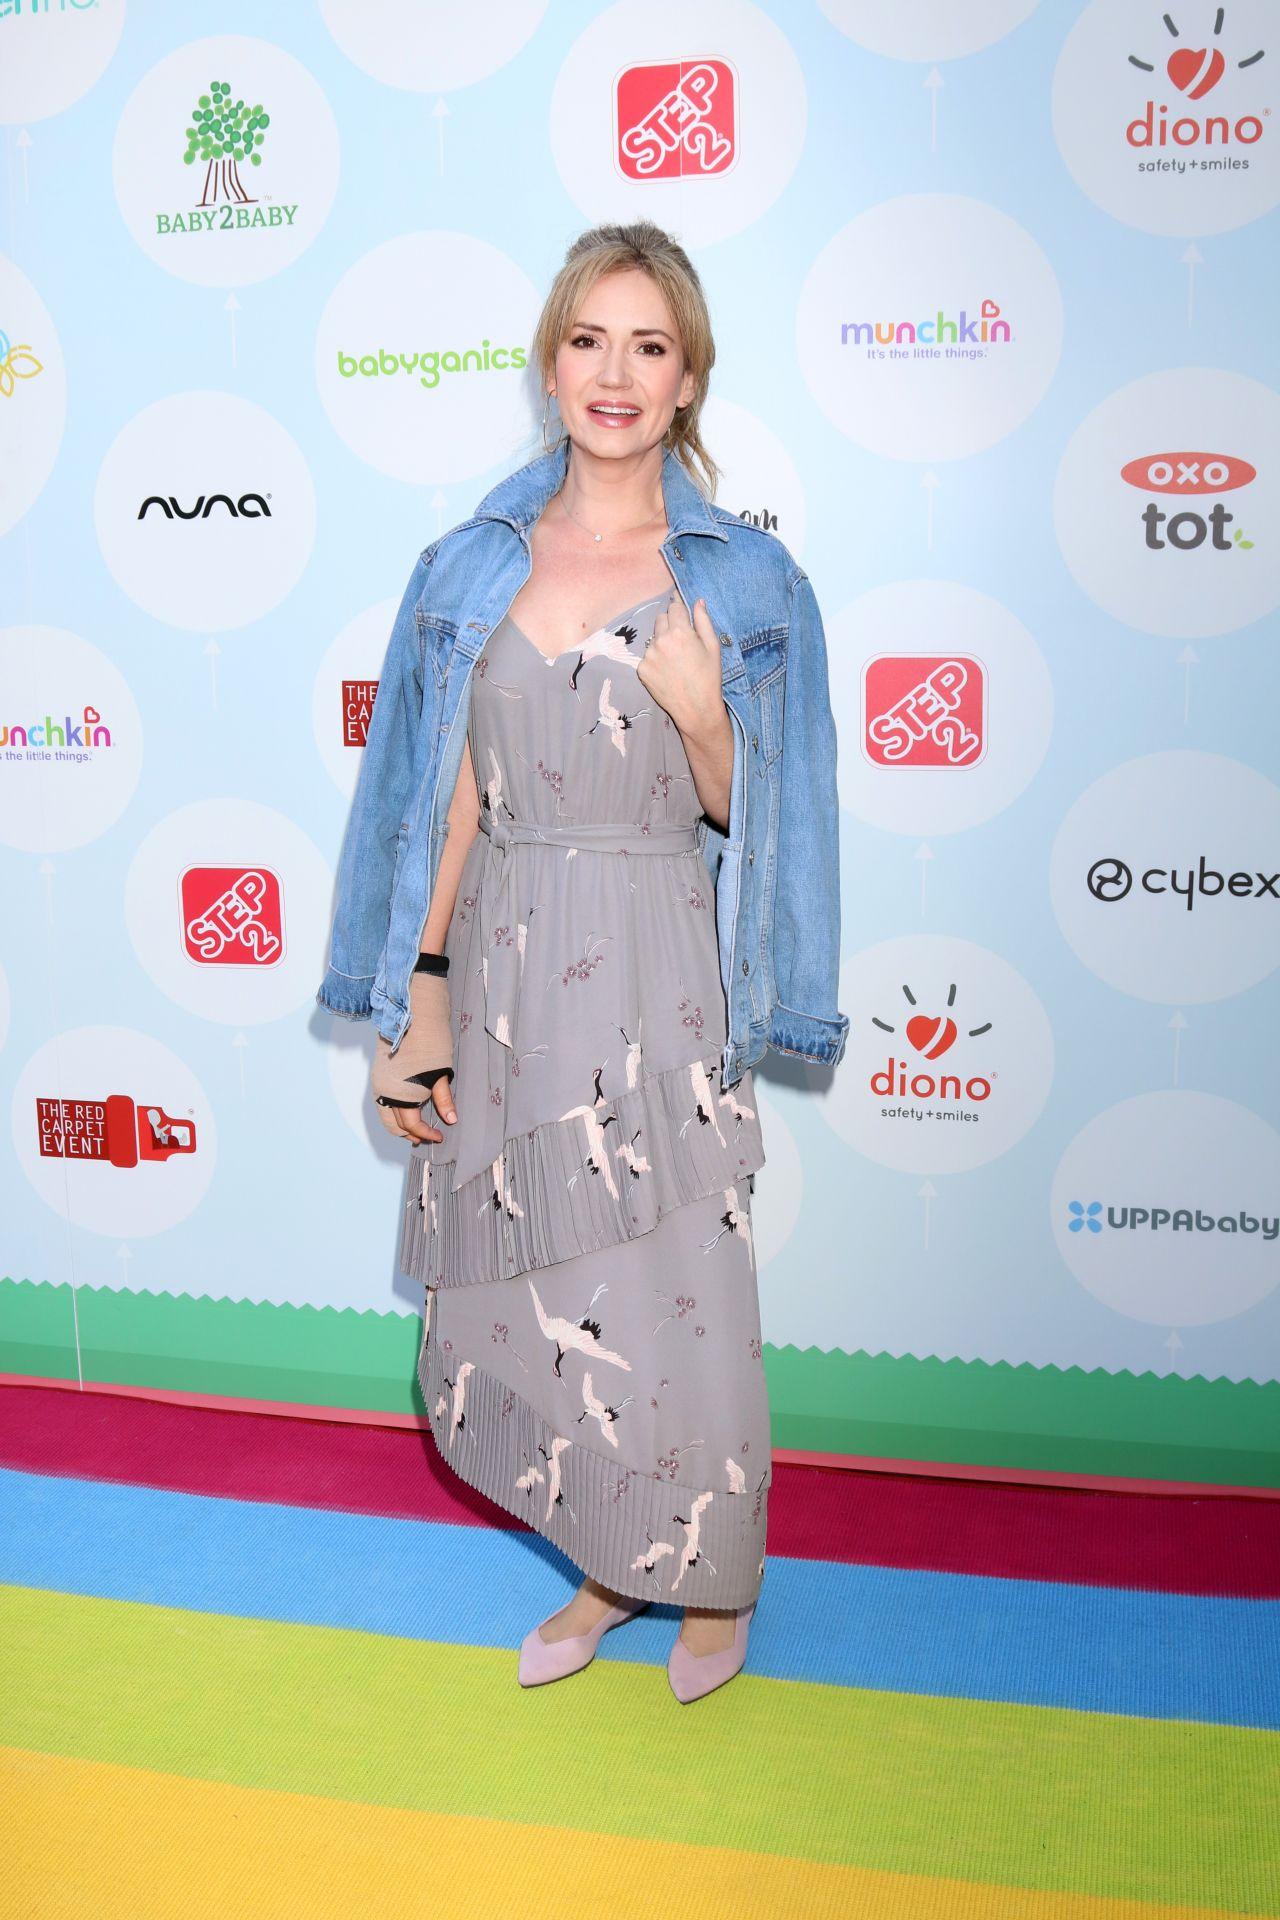 Ashley Jones Celebrity Red Carpet Safety Awareness Event